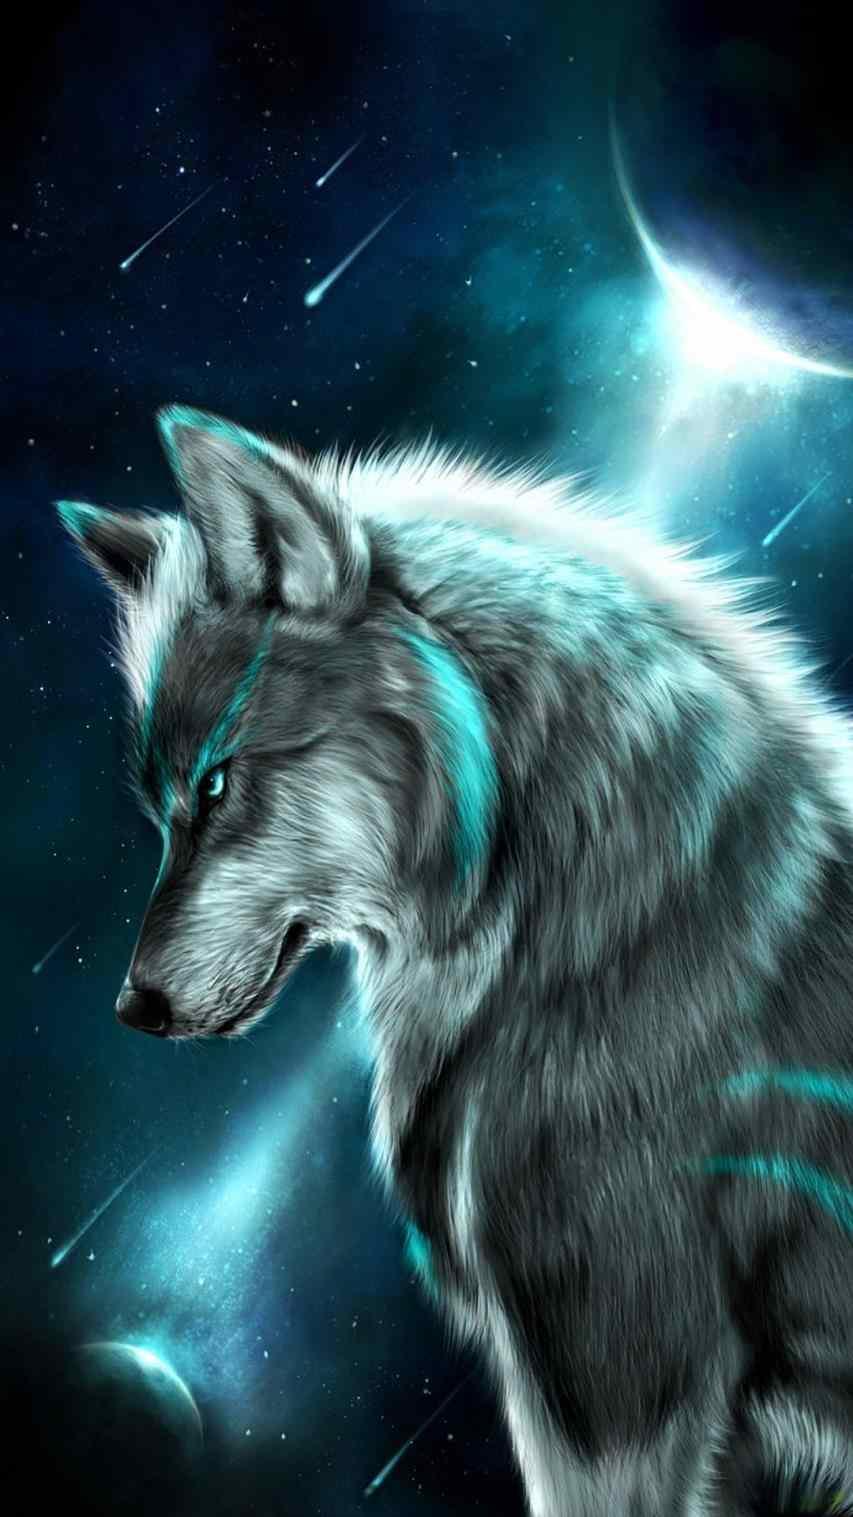 Beautiful Wolf Wallpaper Posted By Ryan Peltier